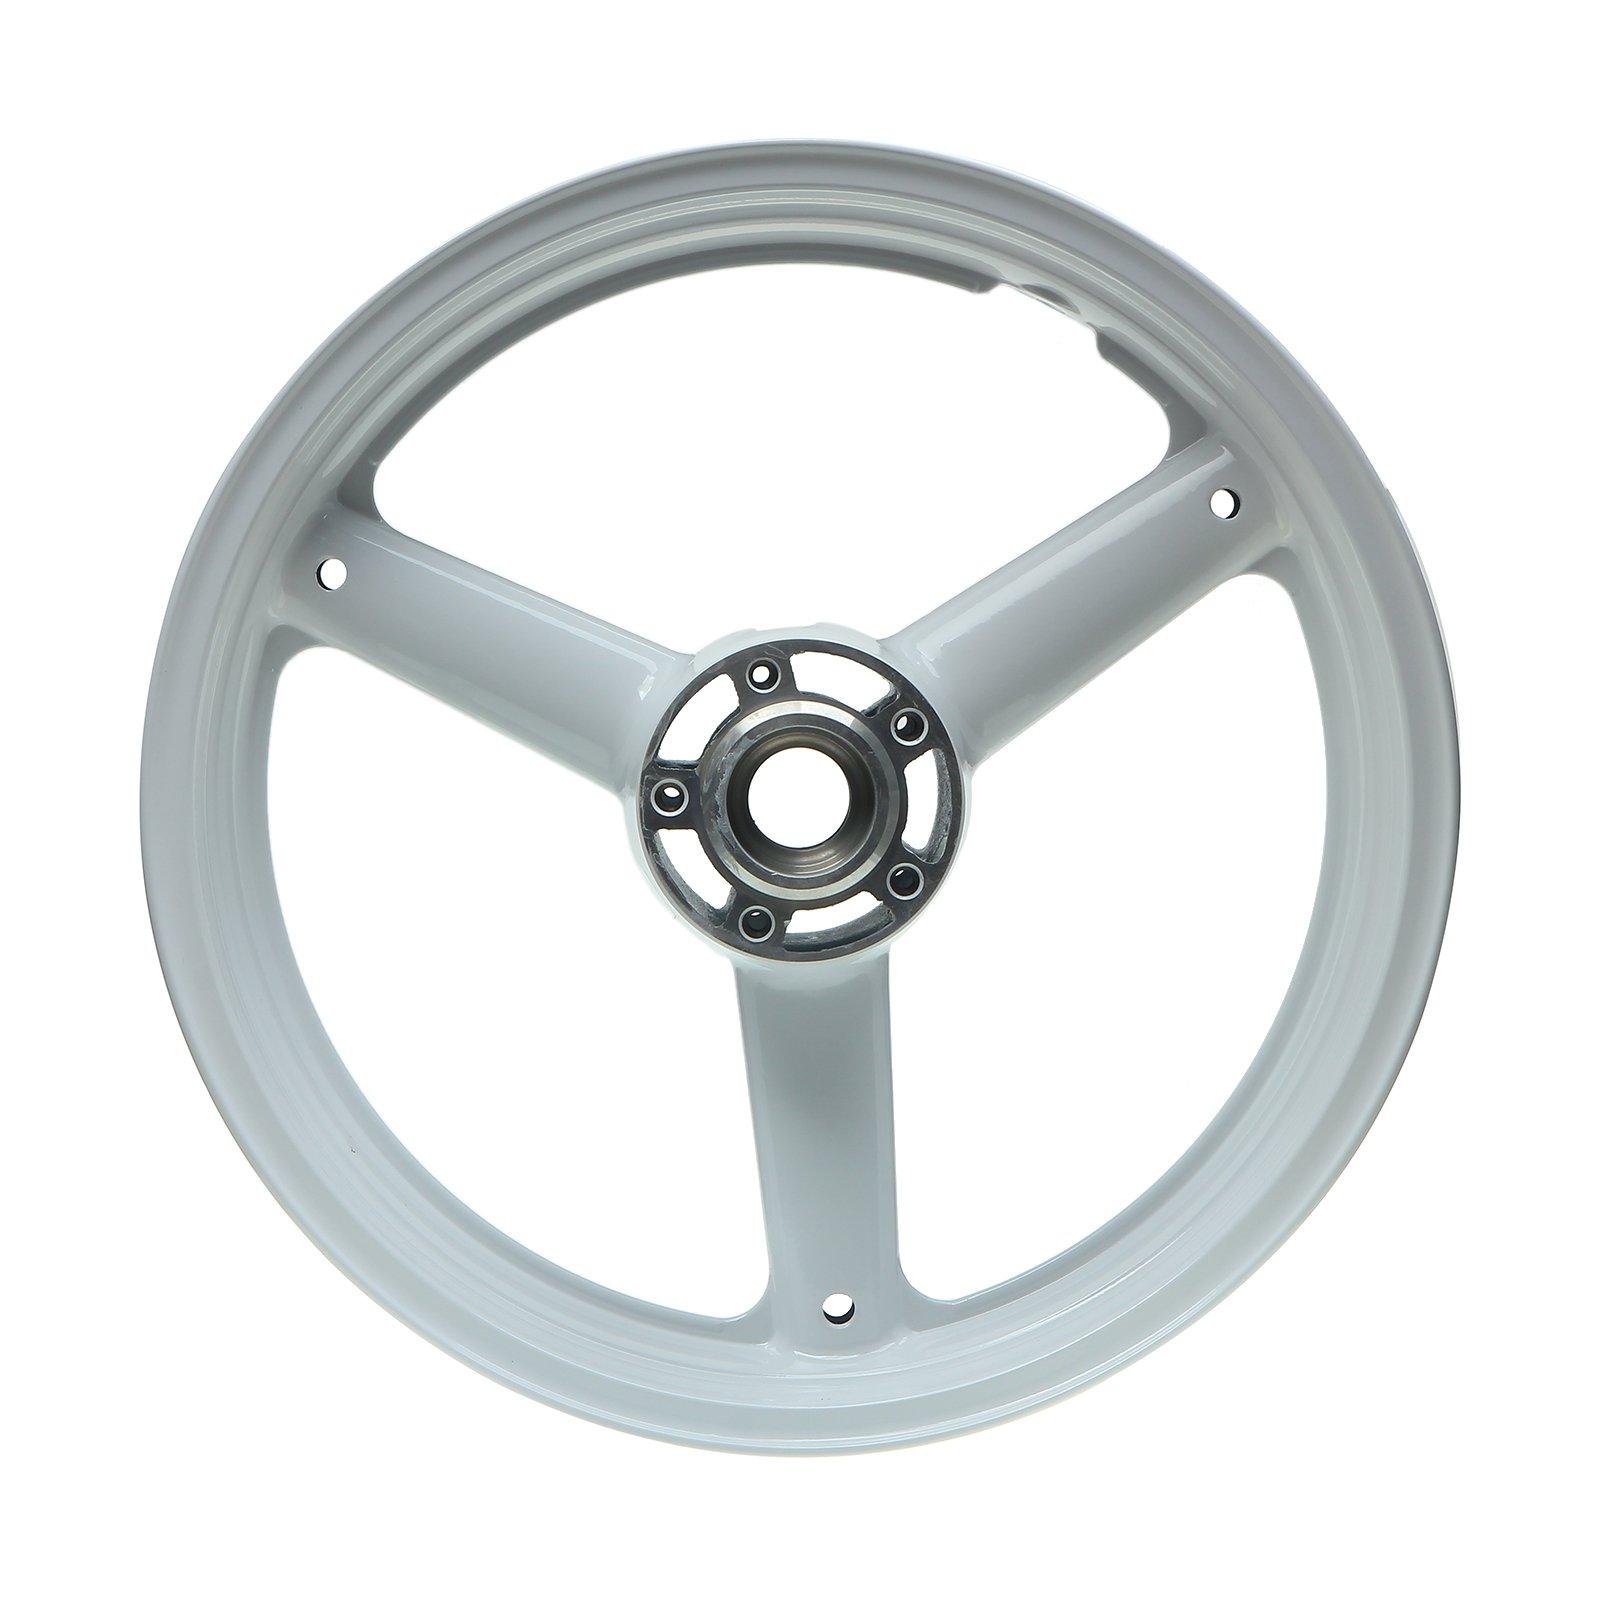 TARAZON 17'' x 3.5'' Alloy Forged Front Wheel Rim SUZUKI Hayabusa GSXR 1300 99-07 White